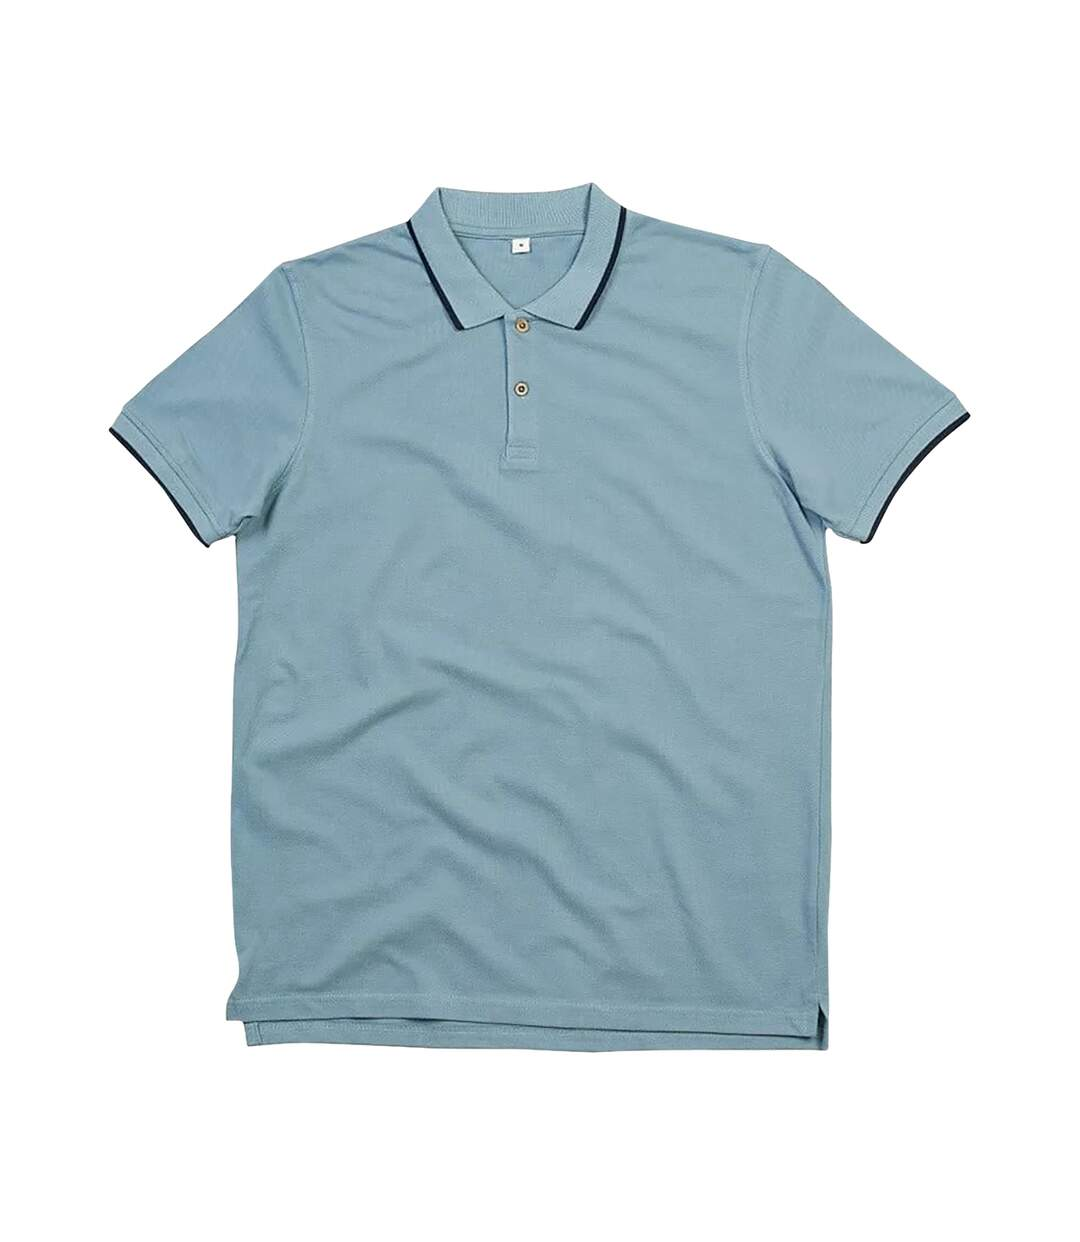 Mantis Mens The Tipped Polo Shirt (Light Denim/Navy) - UTPC3672